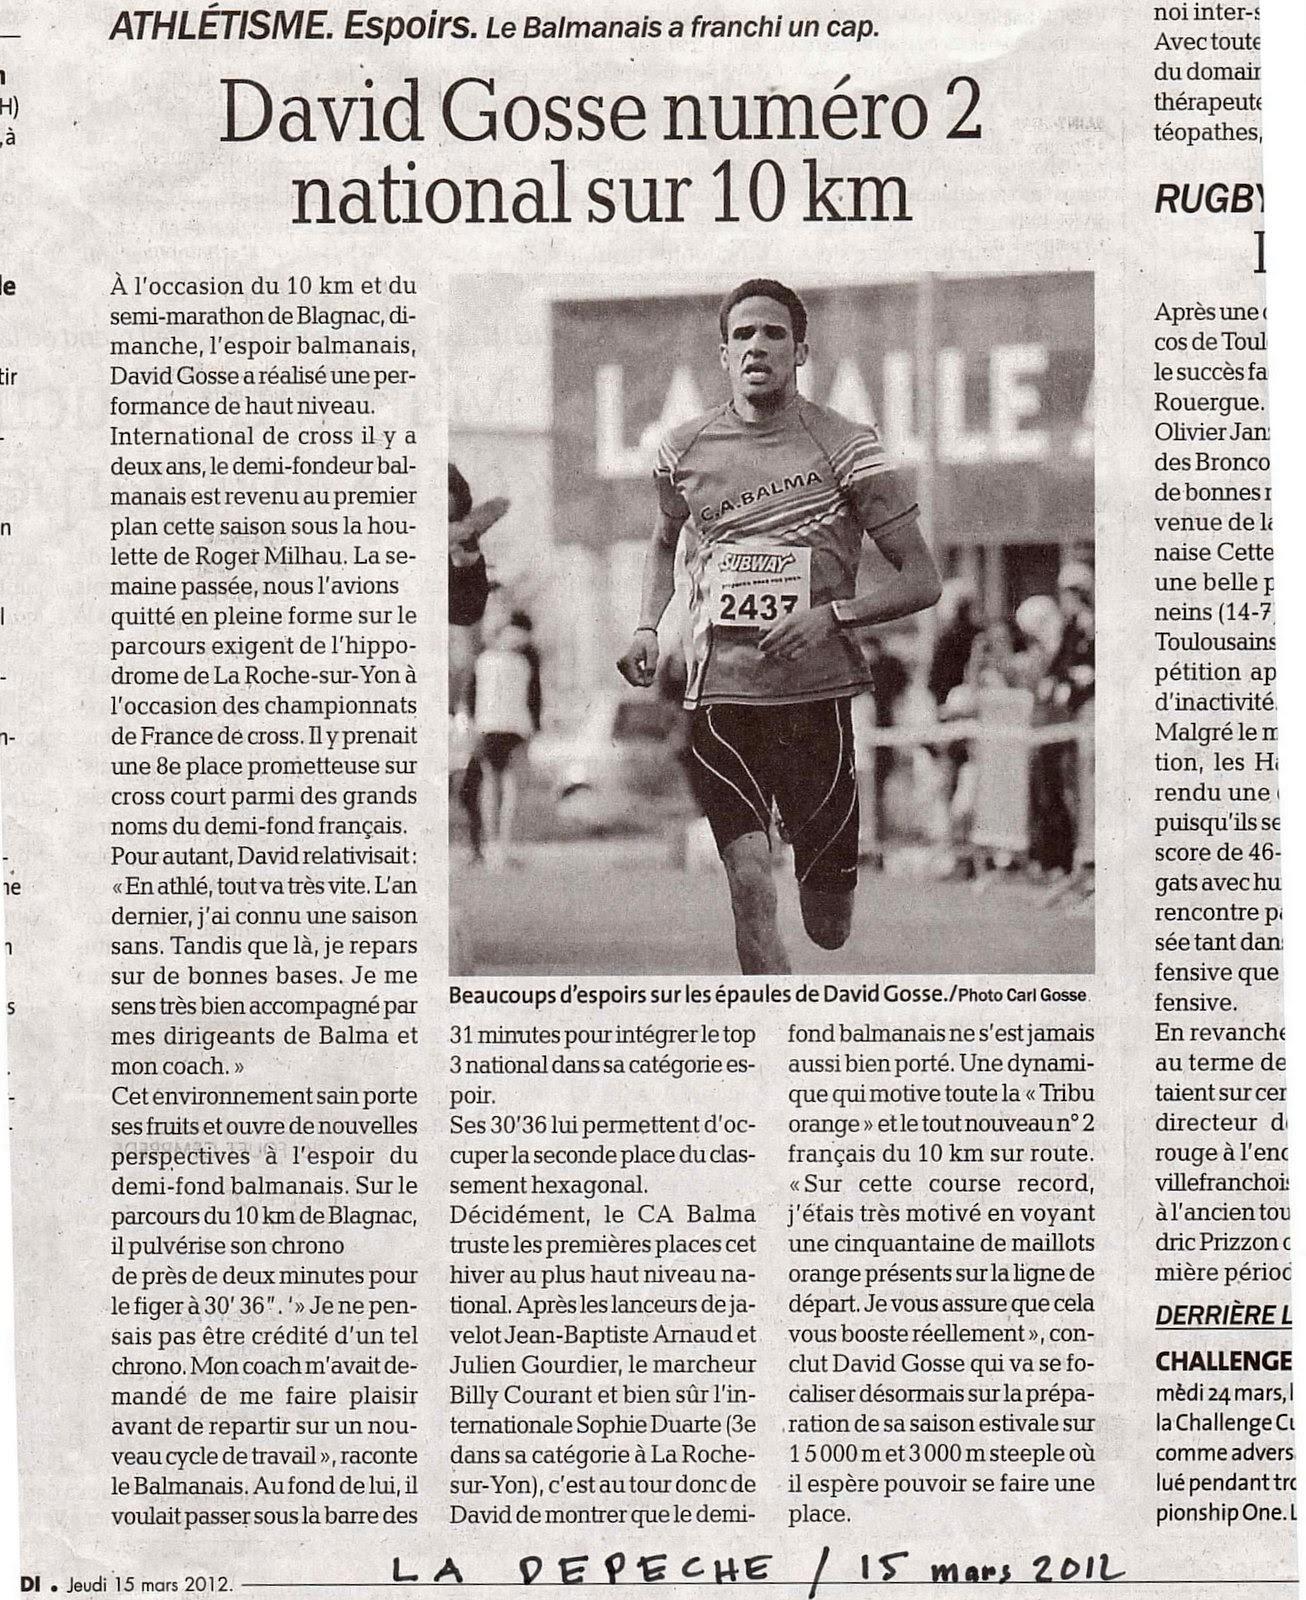 France de 10Km 2012 - second espoir